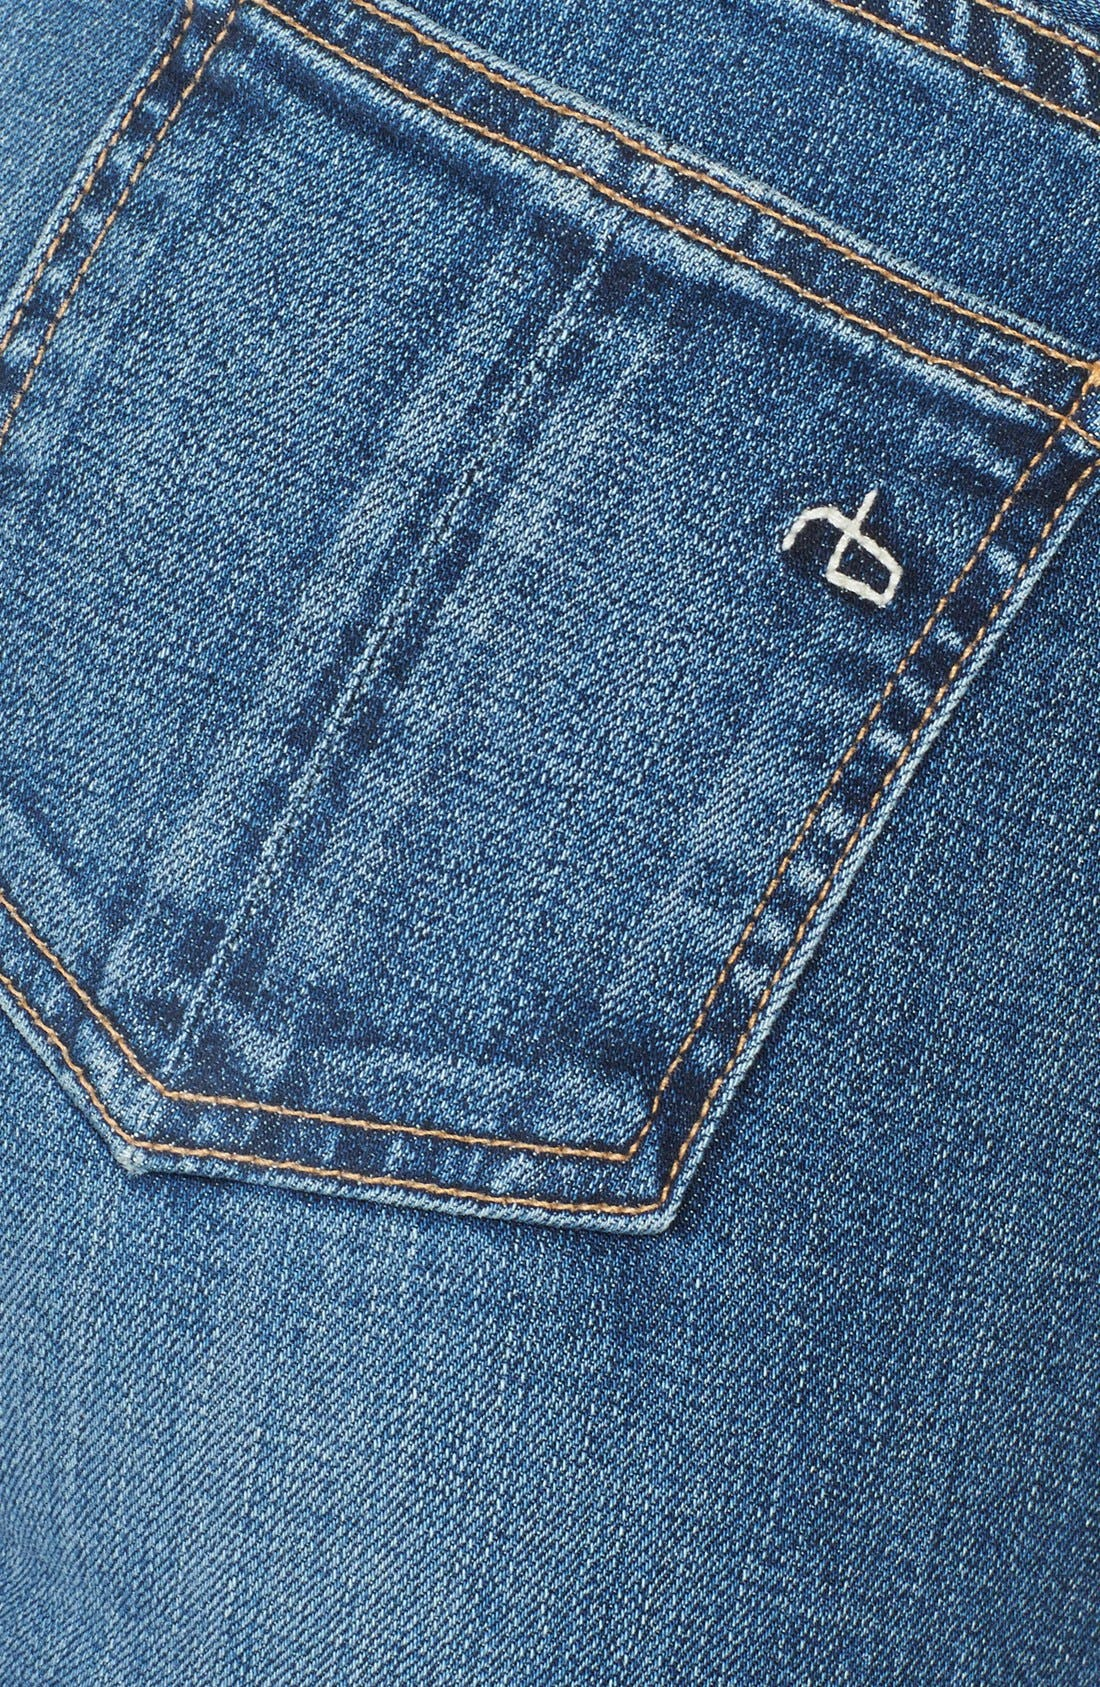 Skinny Stretch Jeans,                             Alternate thumbnail 3, color,                             Sloan Plaid Repair